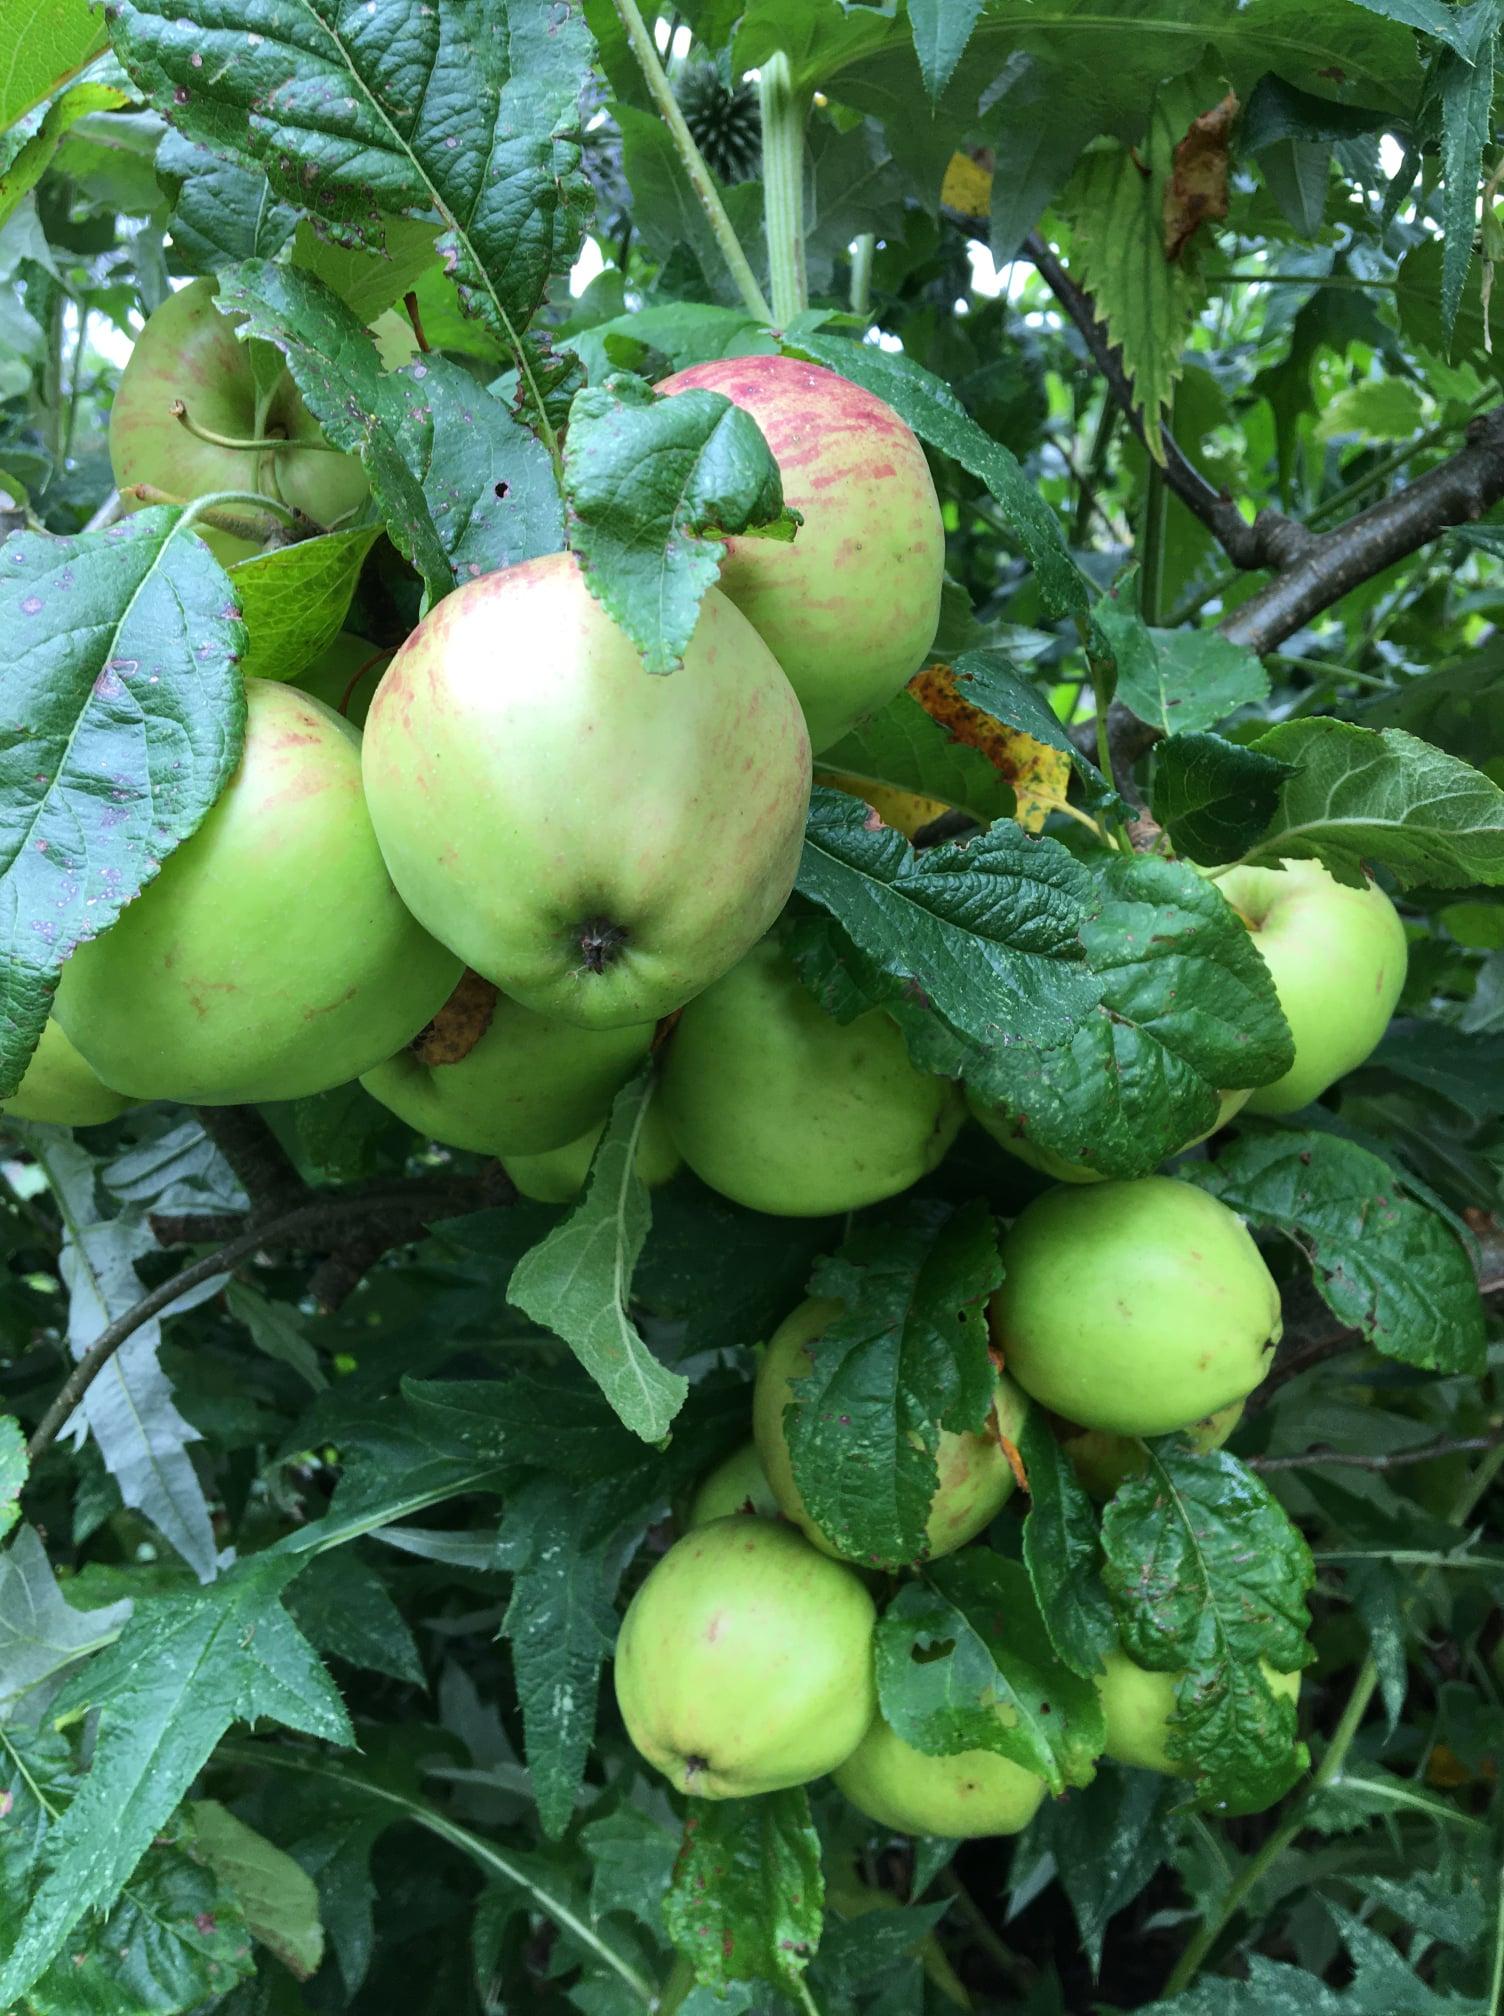 Best Plants For Growing In Chalky Soil Apple tree